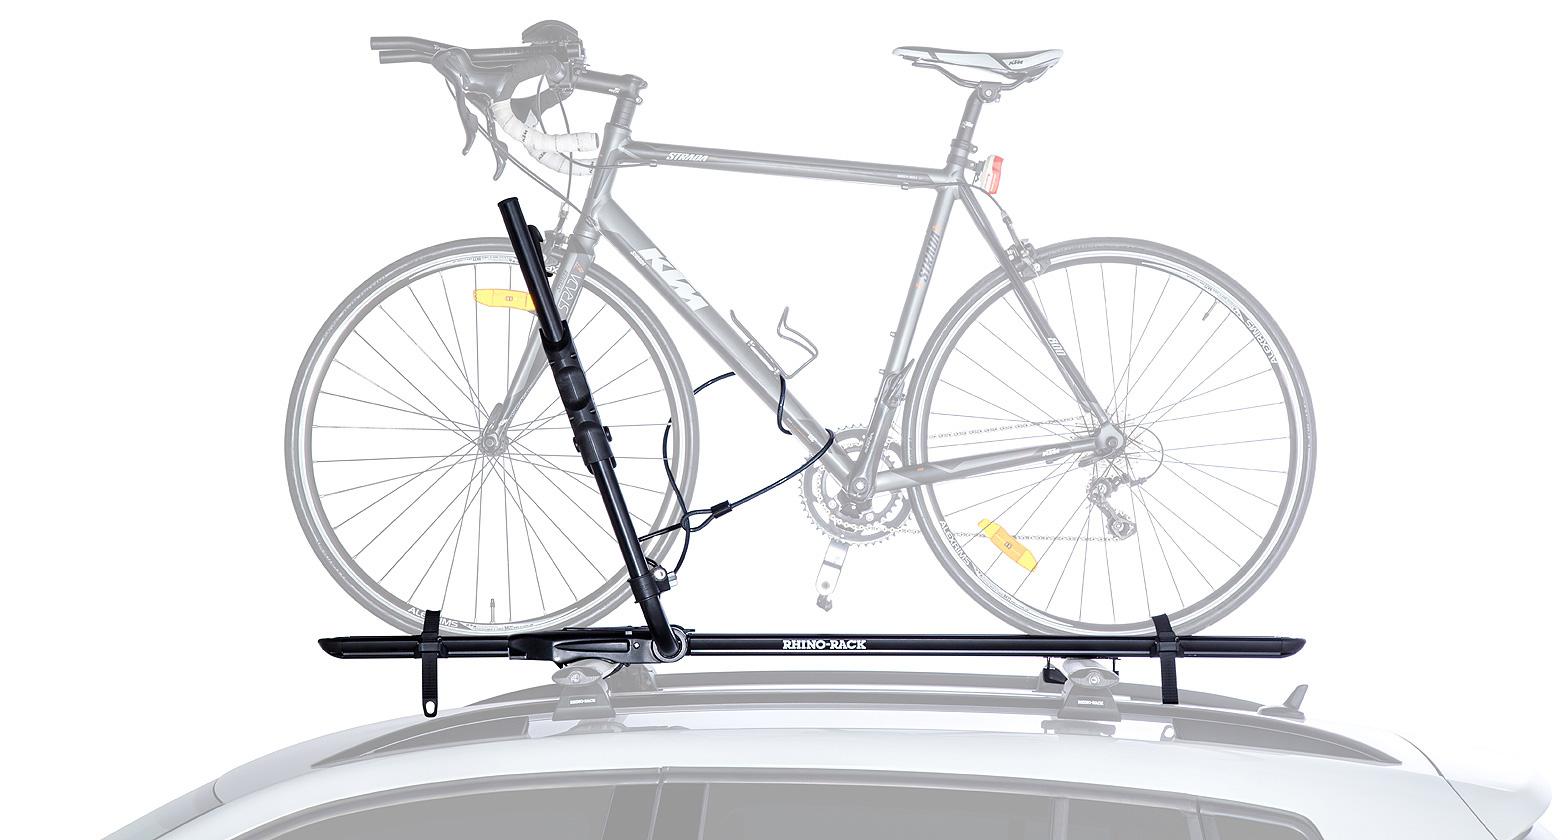 Rbc050 Hybrid Bike Carrier Rhino Rack